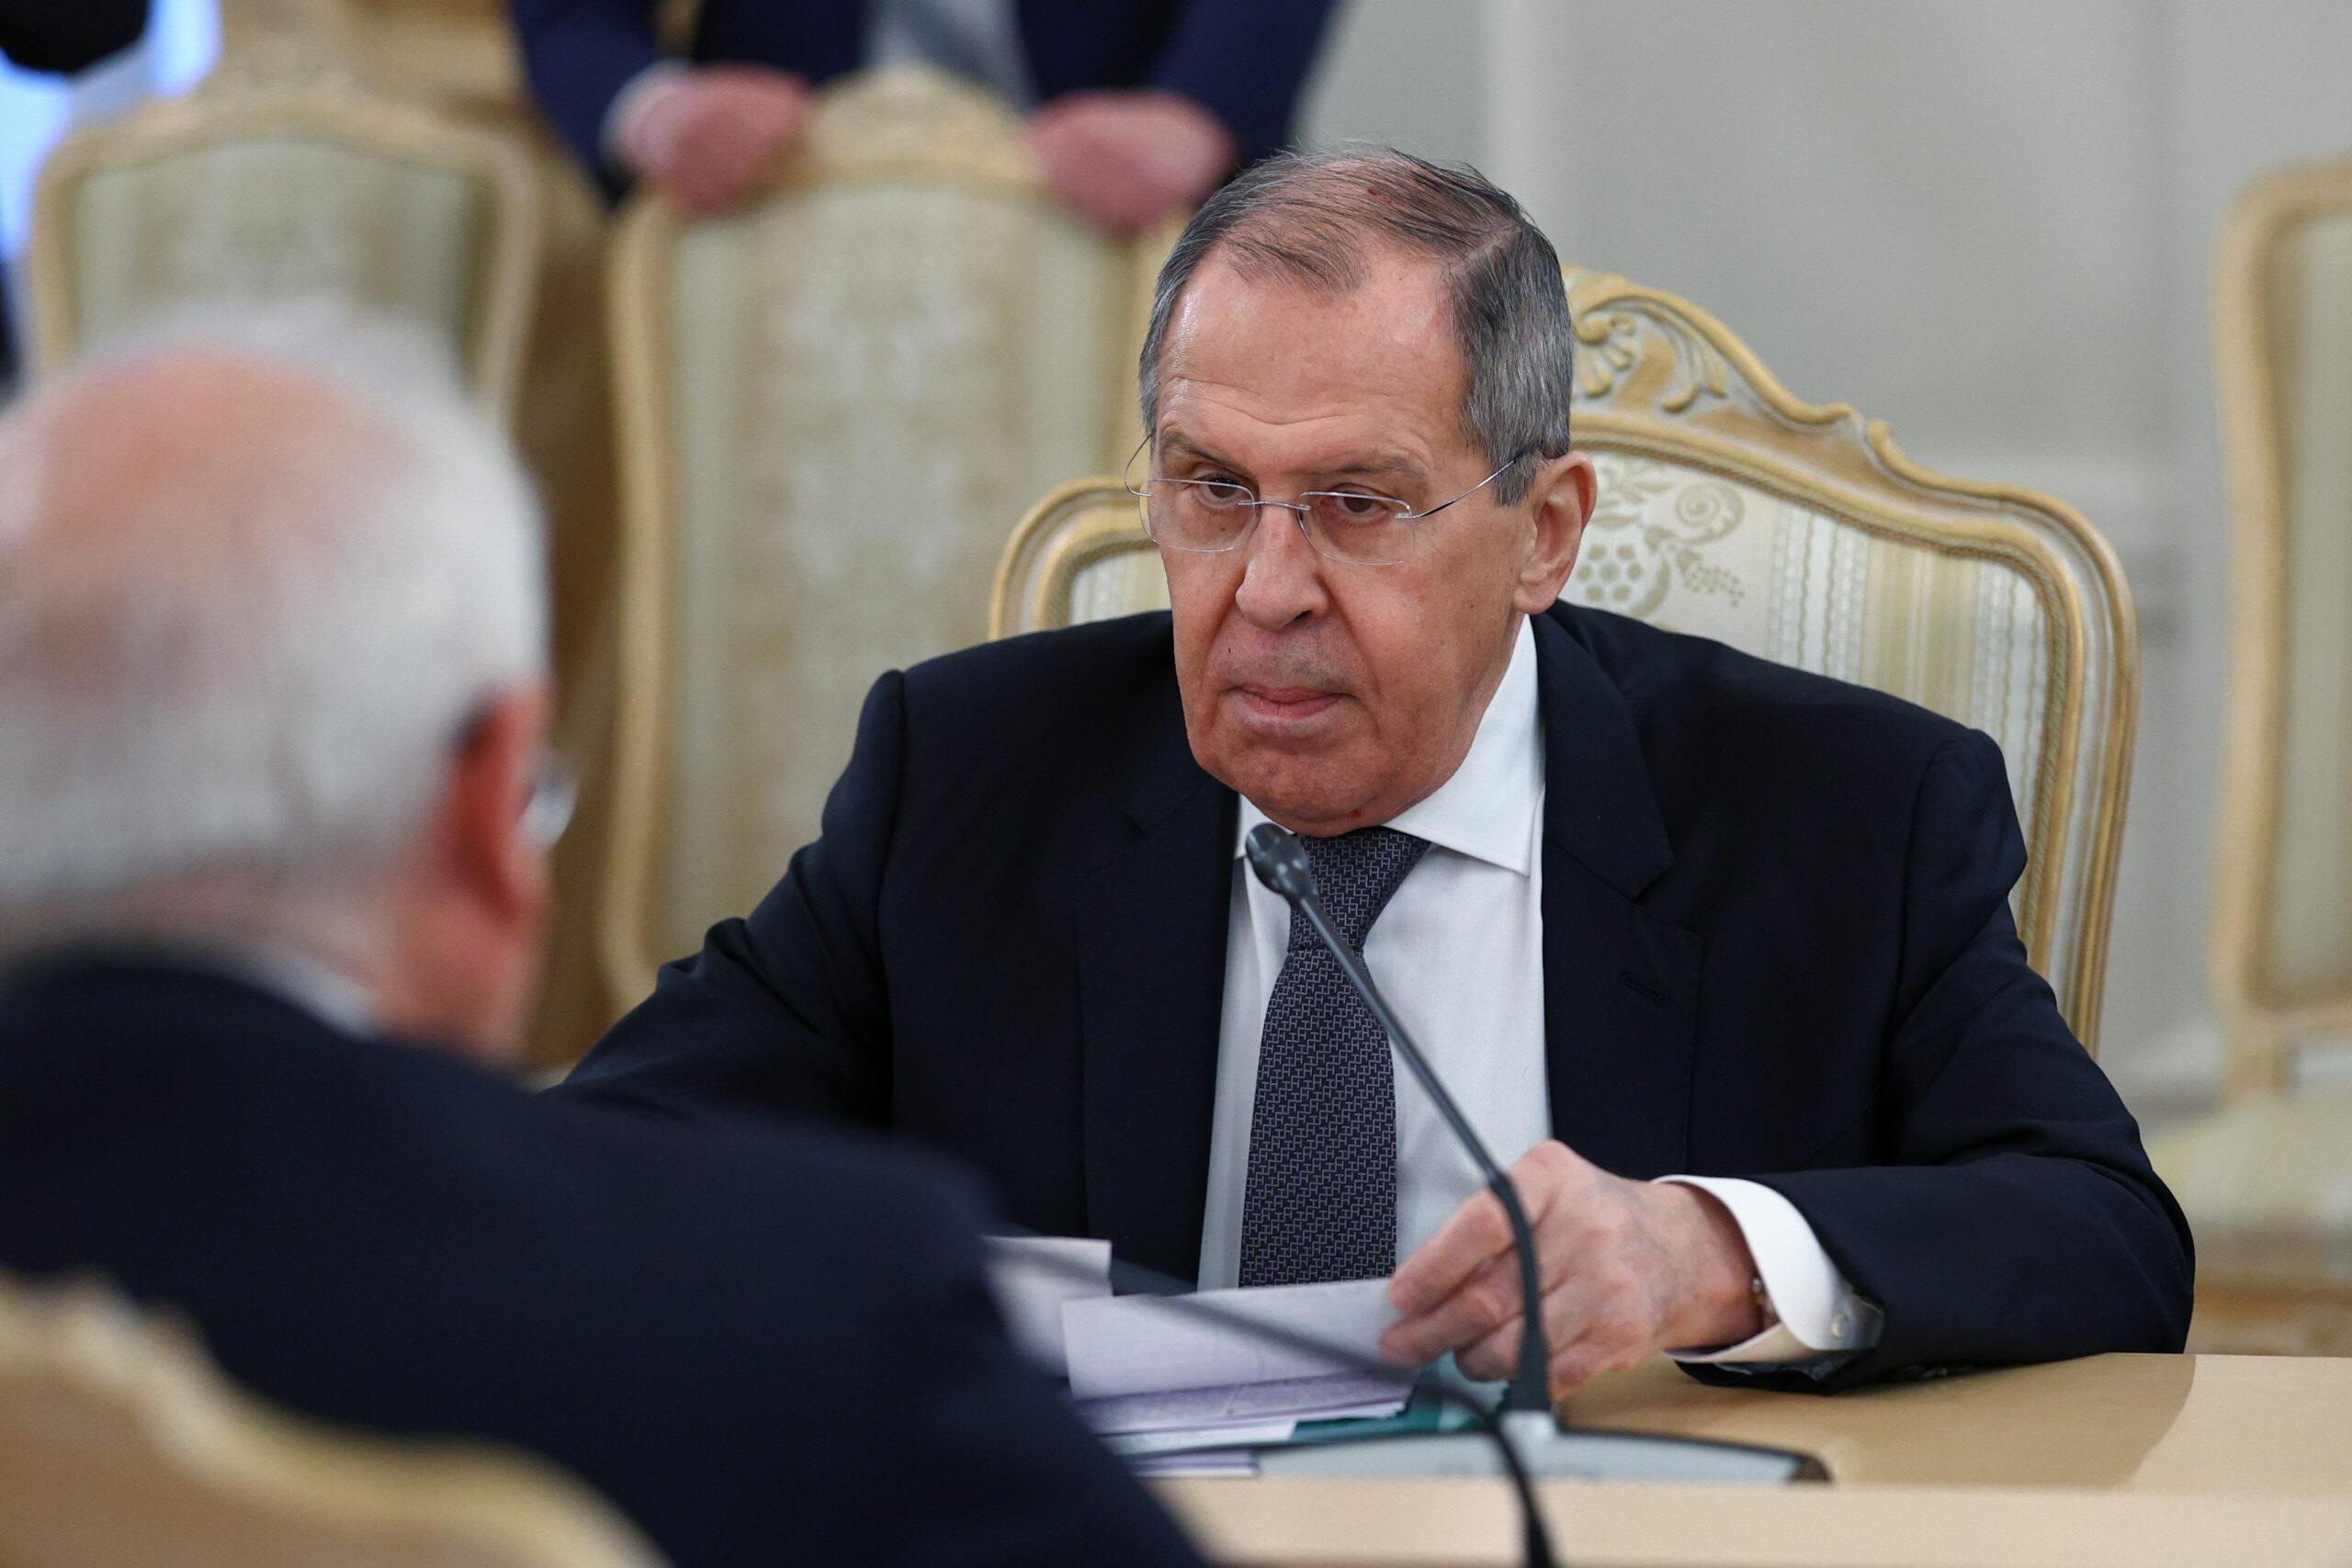 El ministre d'Afers Exteriors de Rússia, Sergei Lavrov | ACN